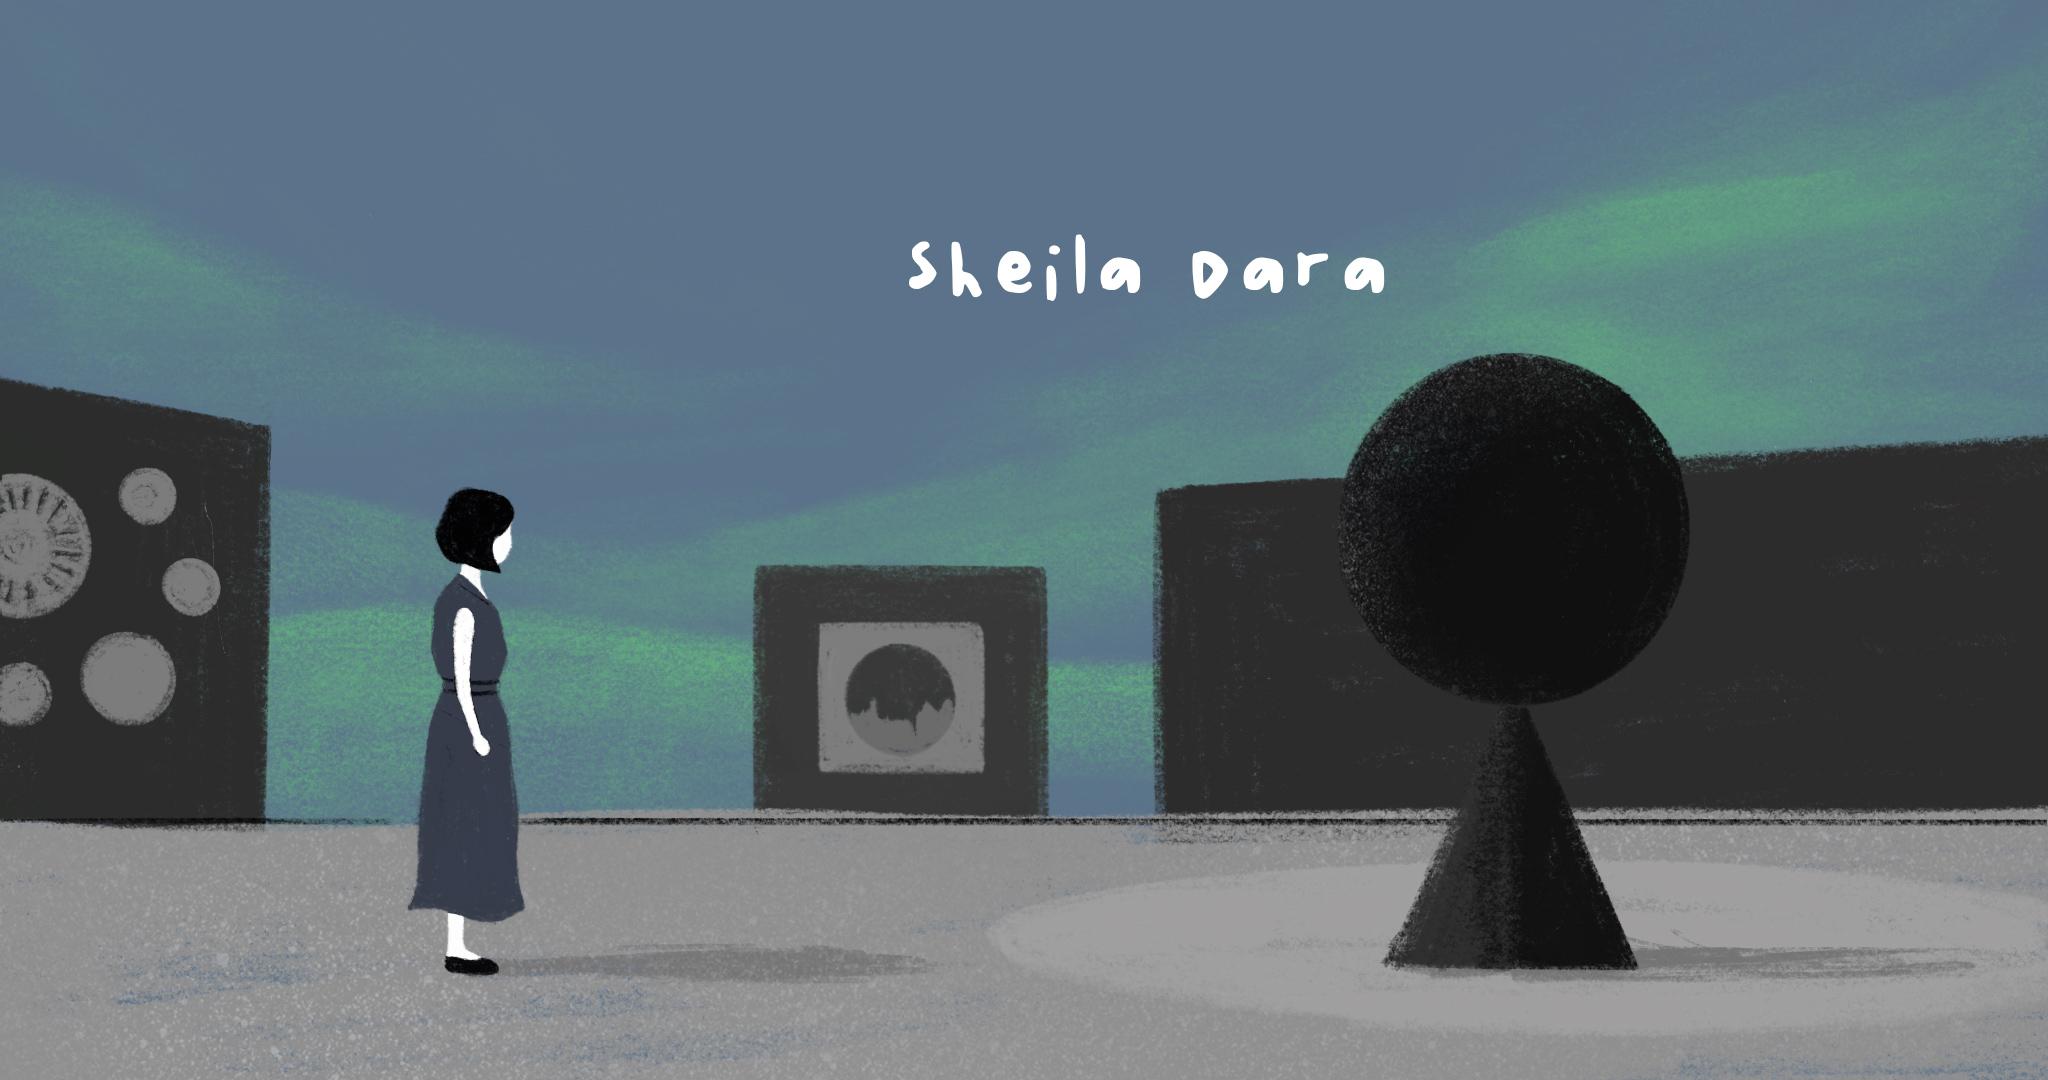 S20_Sheila Dara_02